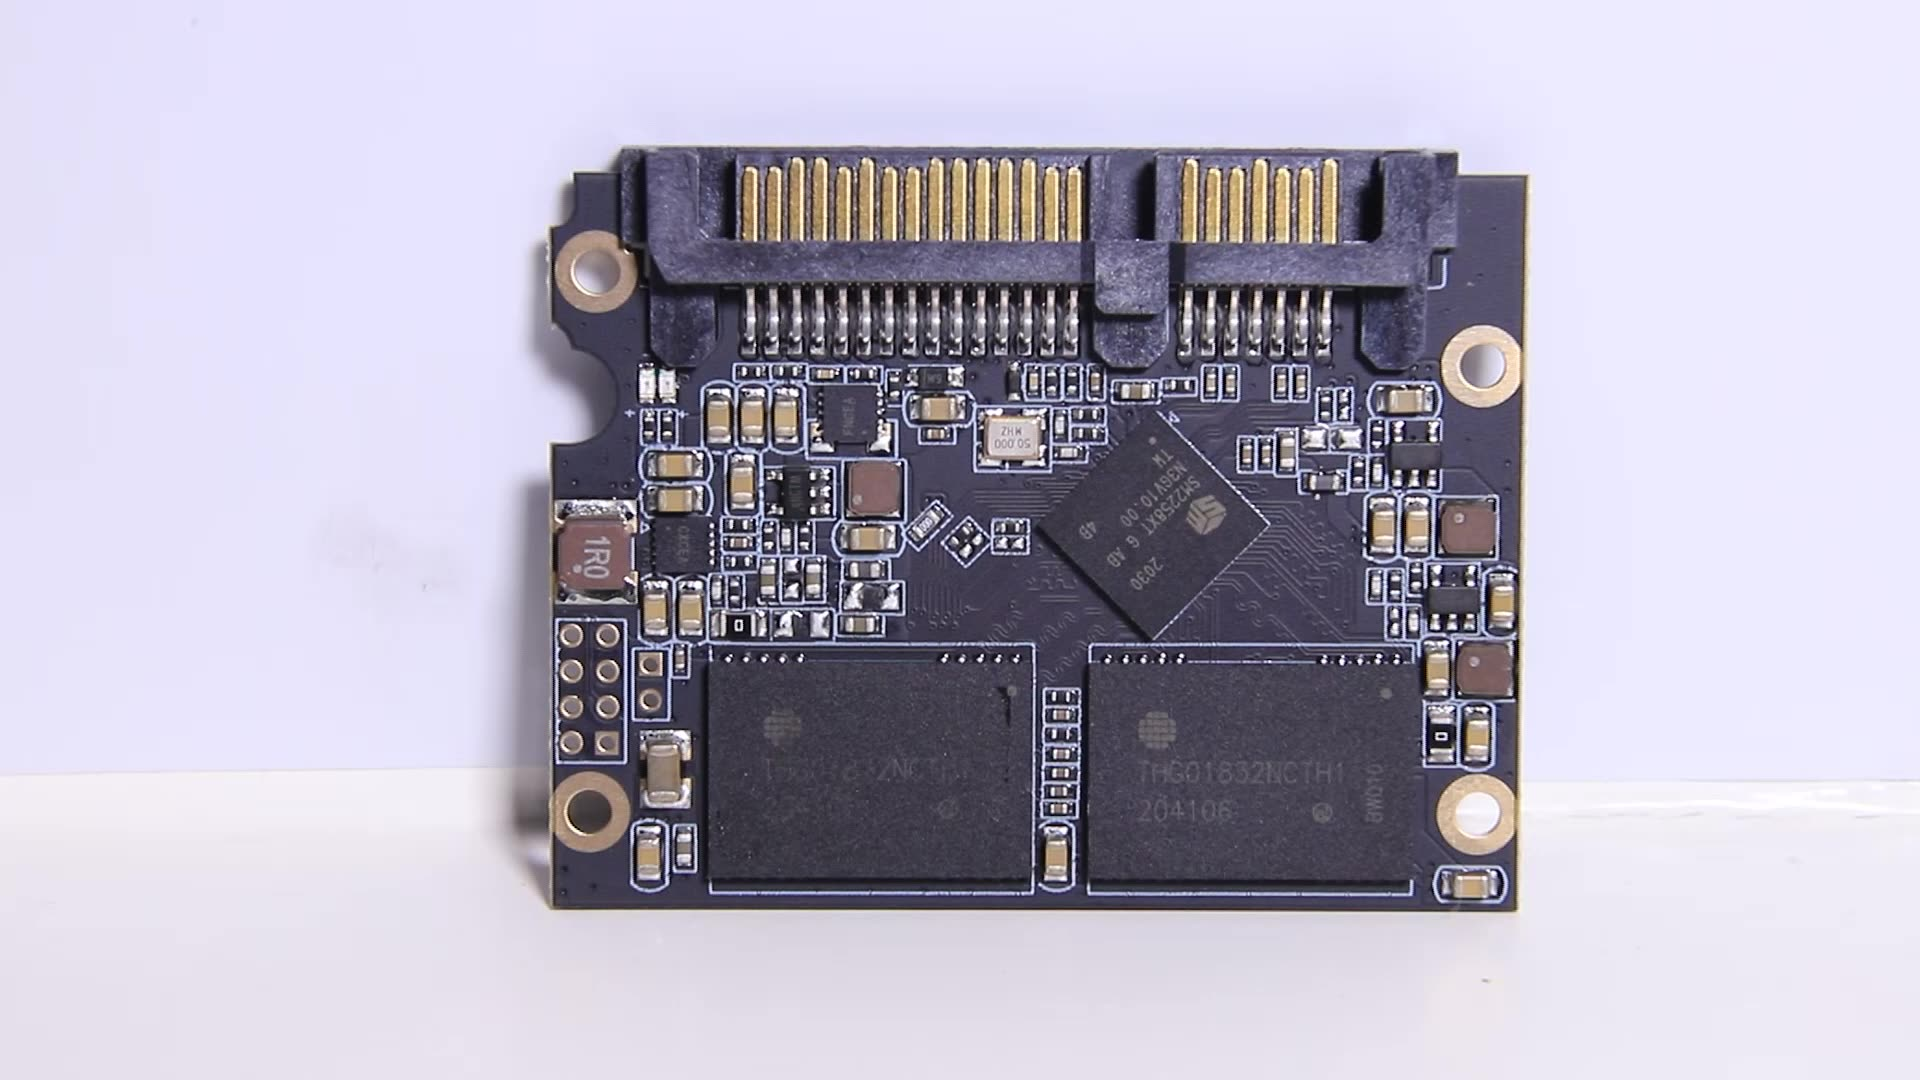 SXmicro 2.5 inch SATA 3 1TB 1TB 1tb 1tb SATA3 SSD internal solid state hard drive for laptop PC